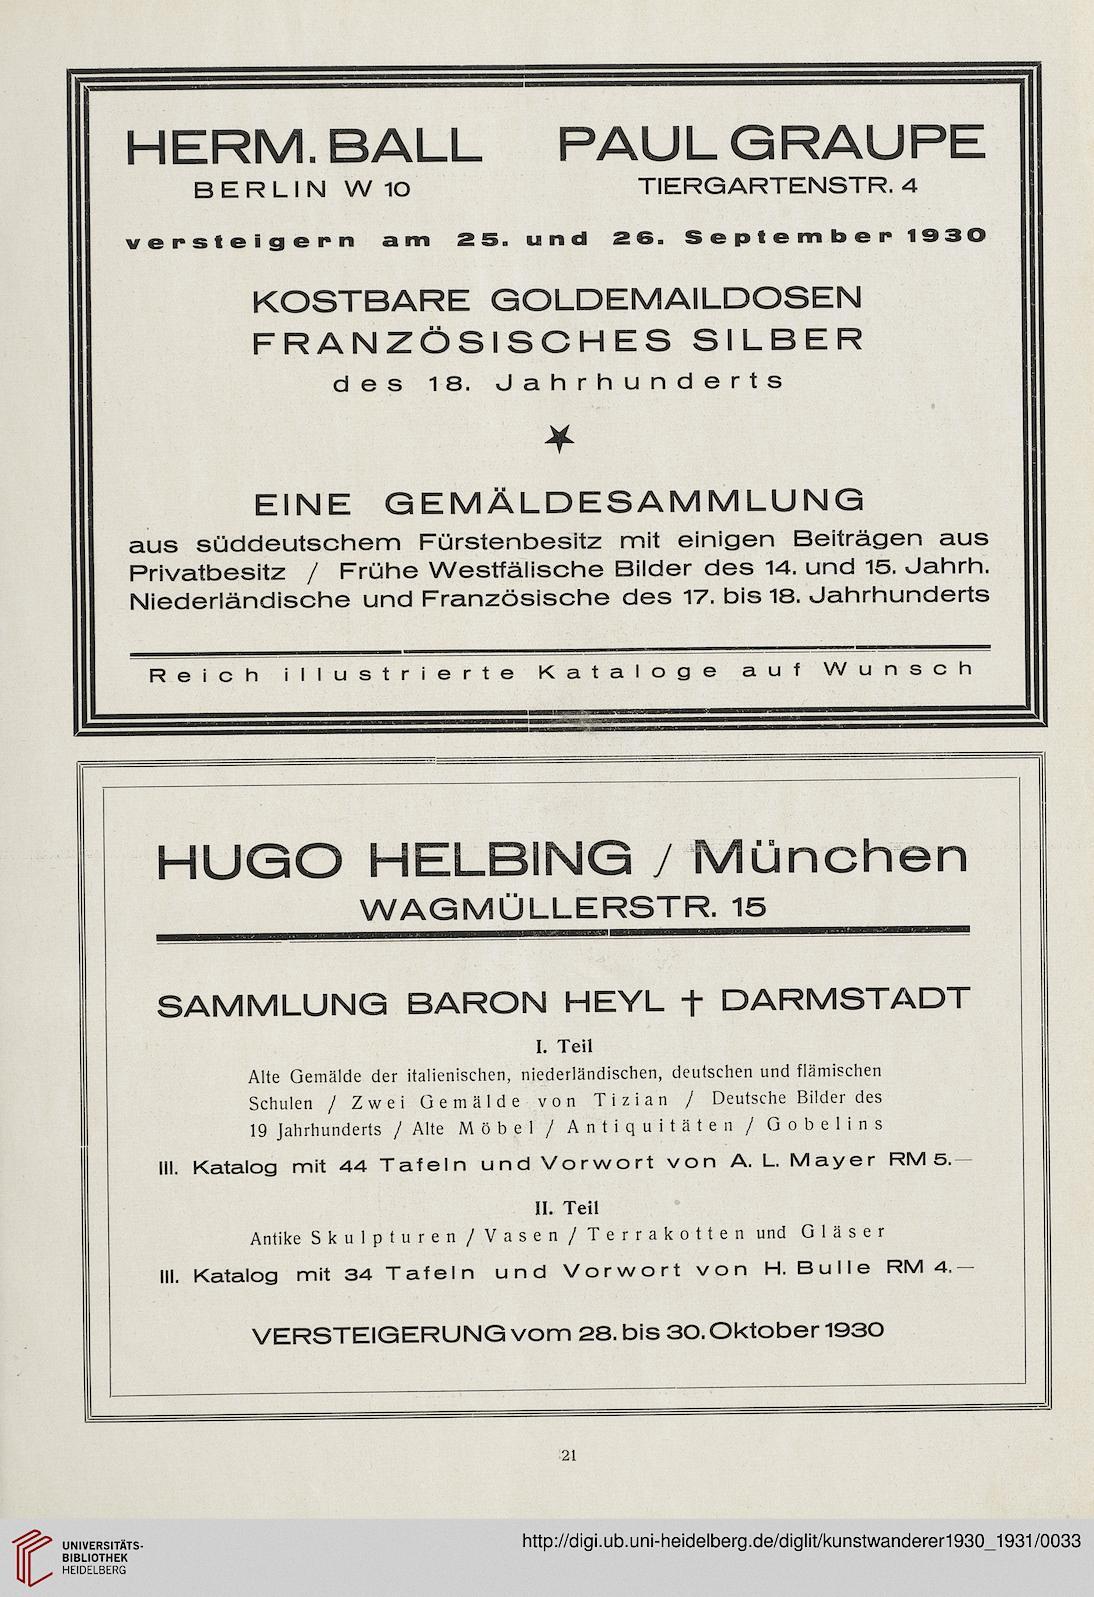 Universitätsbibliothek Heidelberg Httpscreativecommonsorg